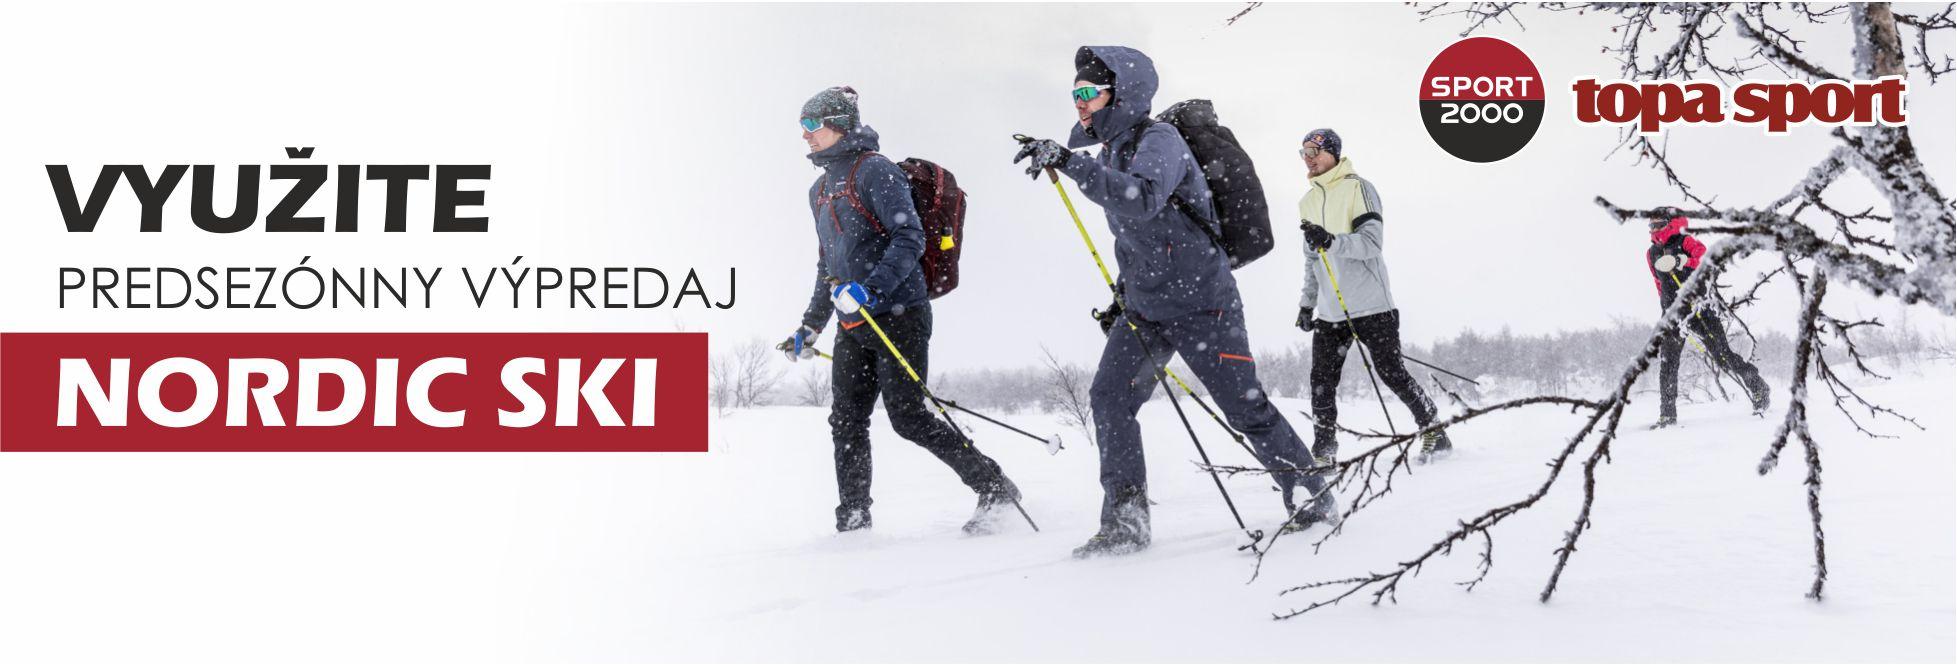 predsezónny vypredaj Nordic